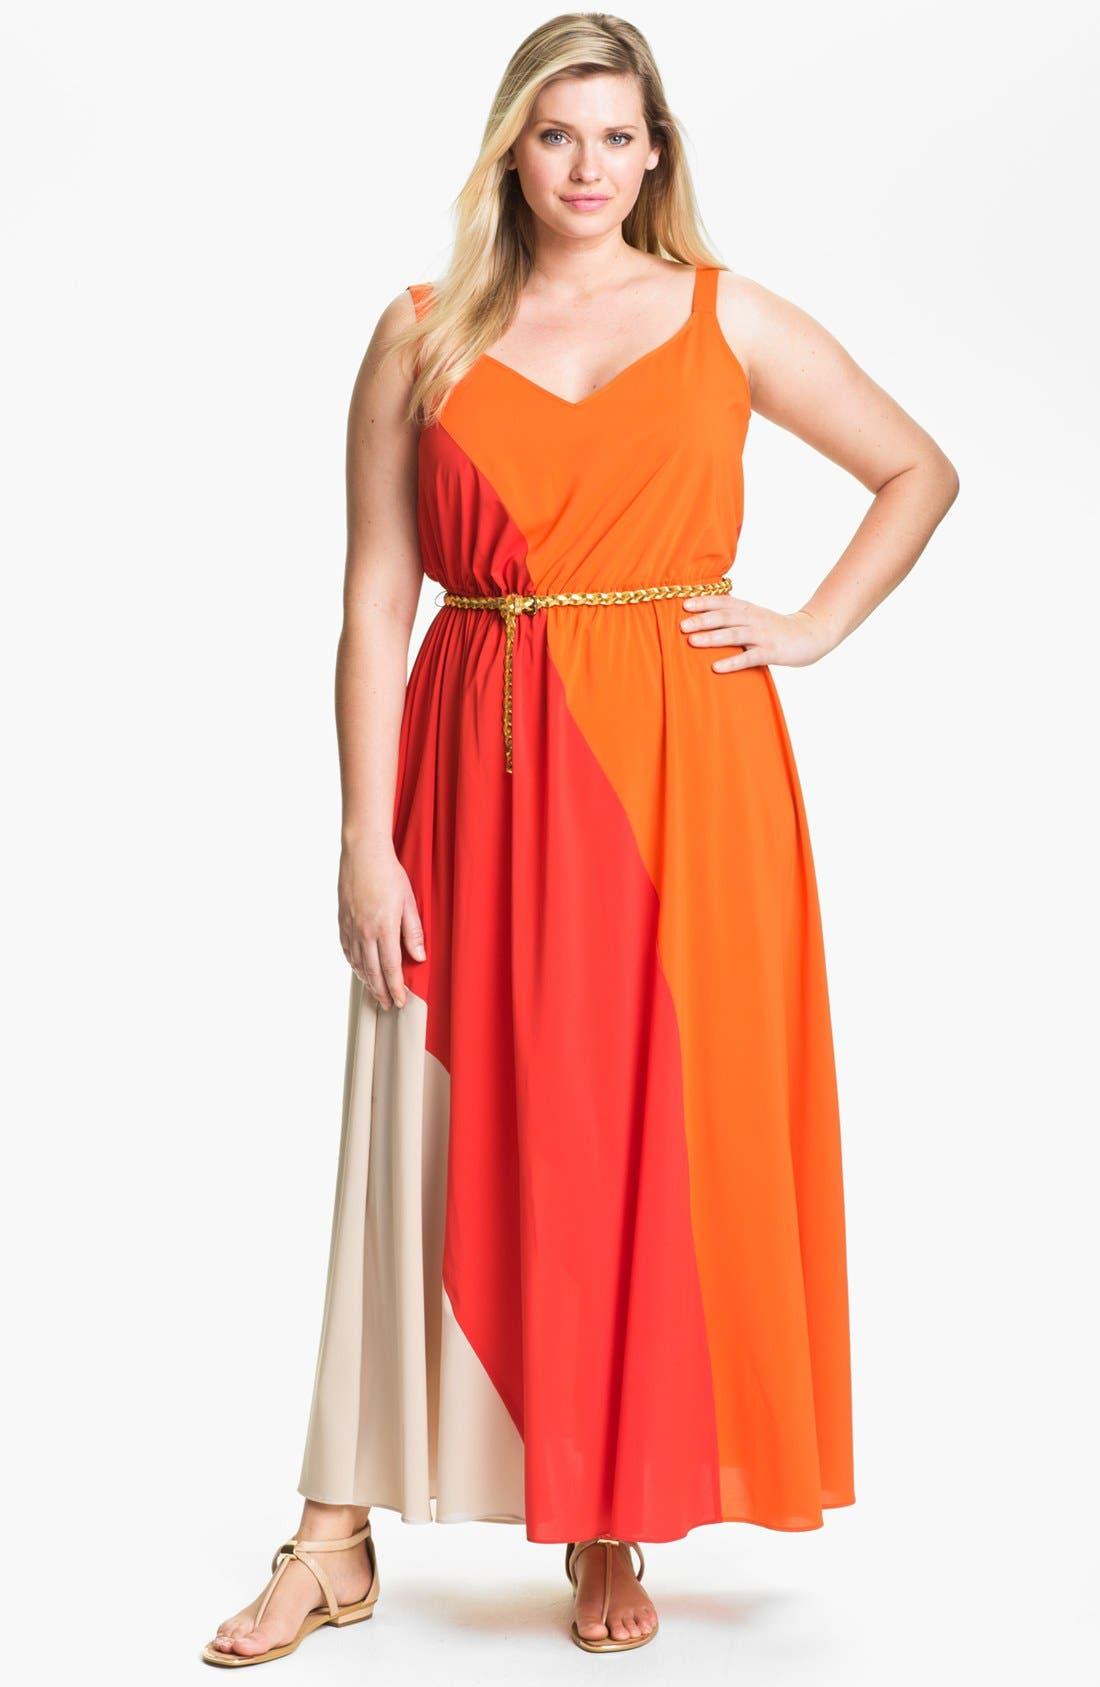 Alternate Image 1 Selected - Calvin Klein Colorblock Chiffon Maxi Dress (Plus Size)